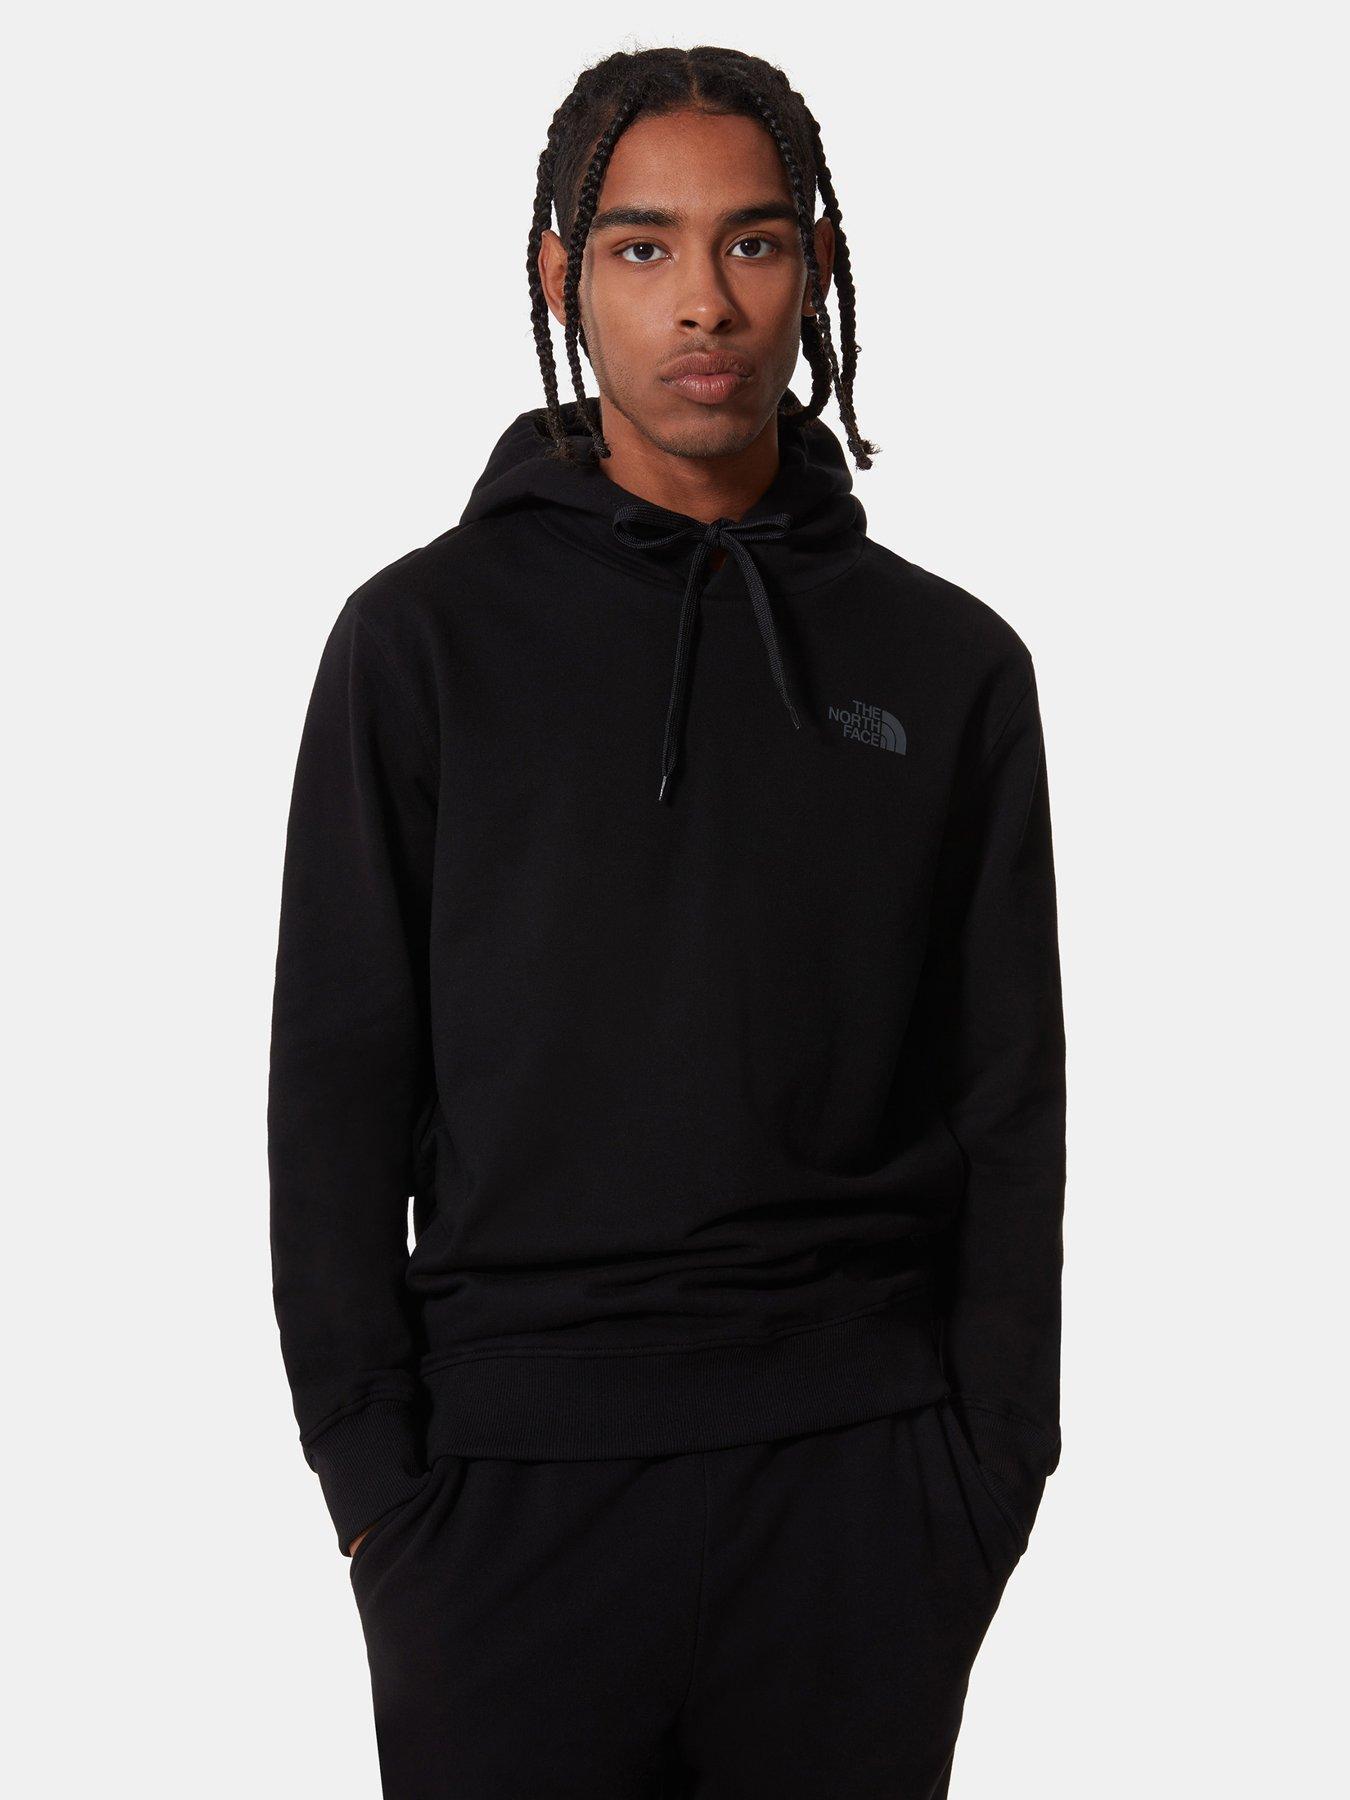 Just Hiker Hoodies Outdoor Space Cotton Sweatshirt Crewneck Sweater Pullover Sportswear